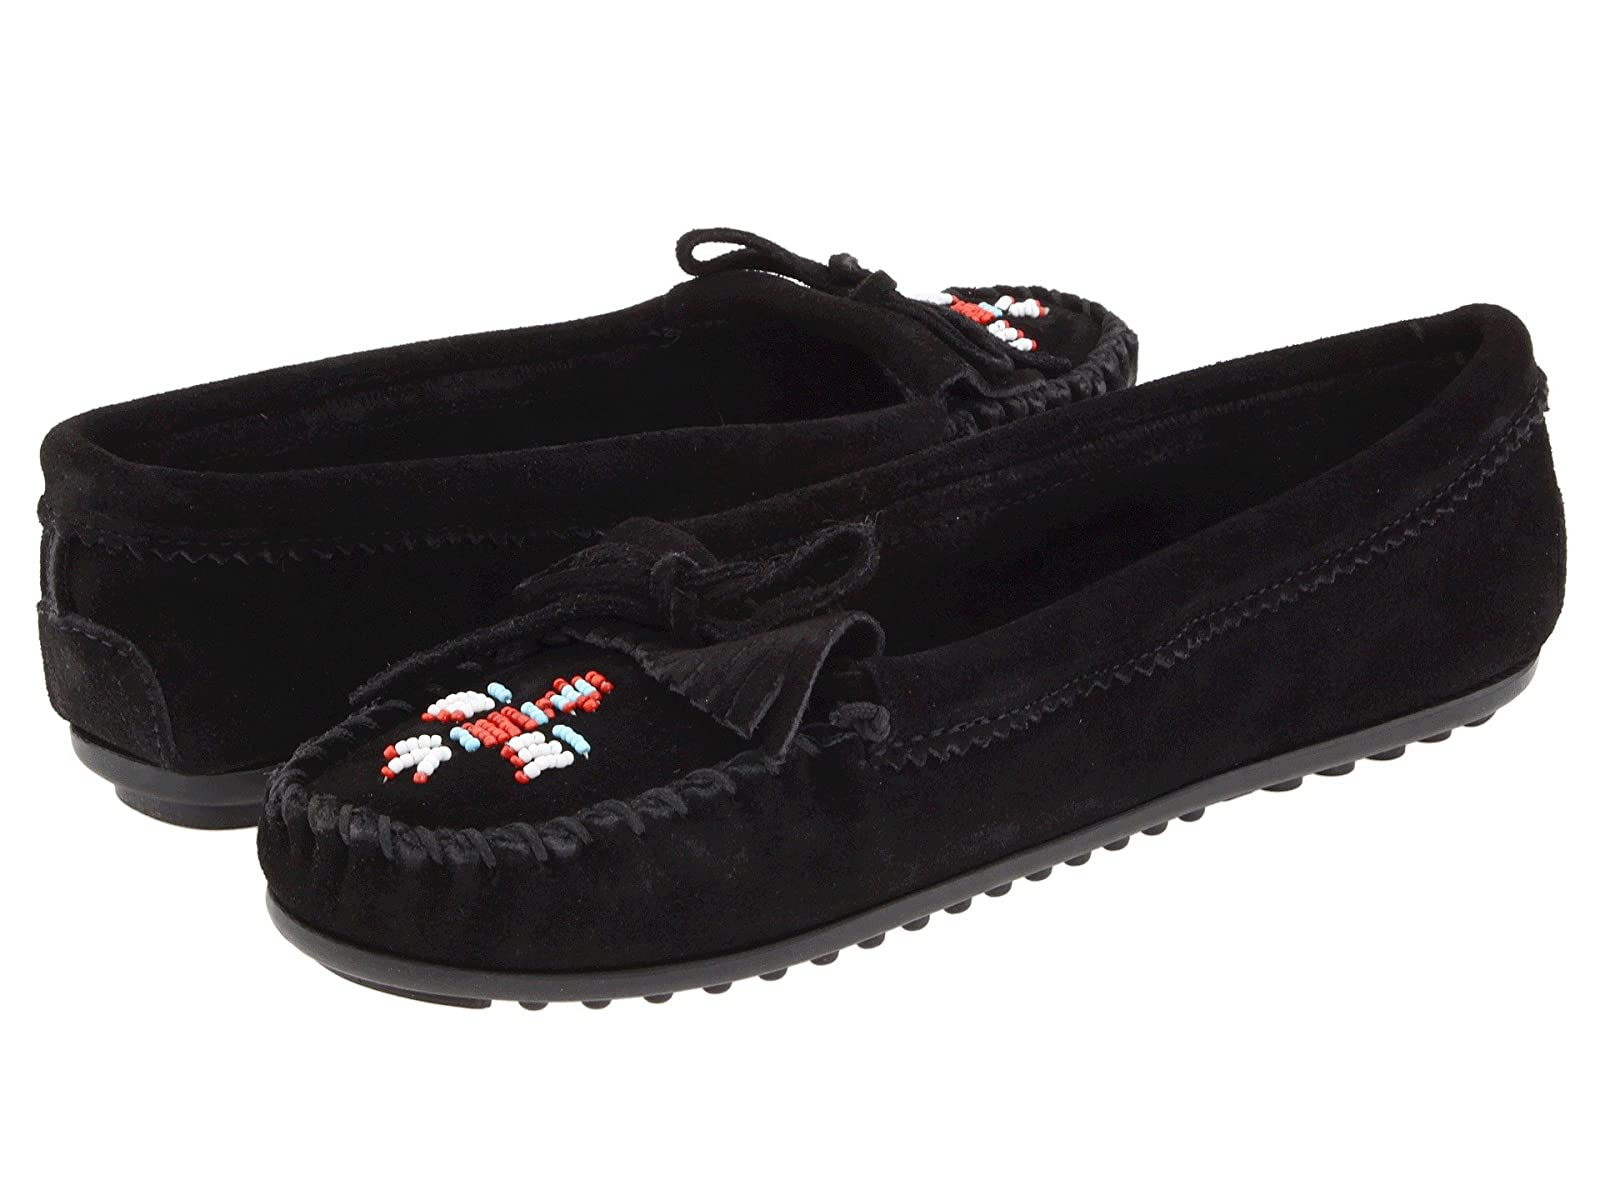 Minnetonka Thunderbird IIAtmospheric grades have affordable shoes